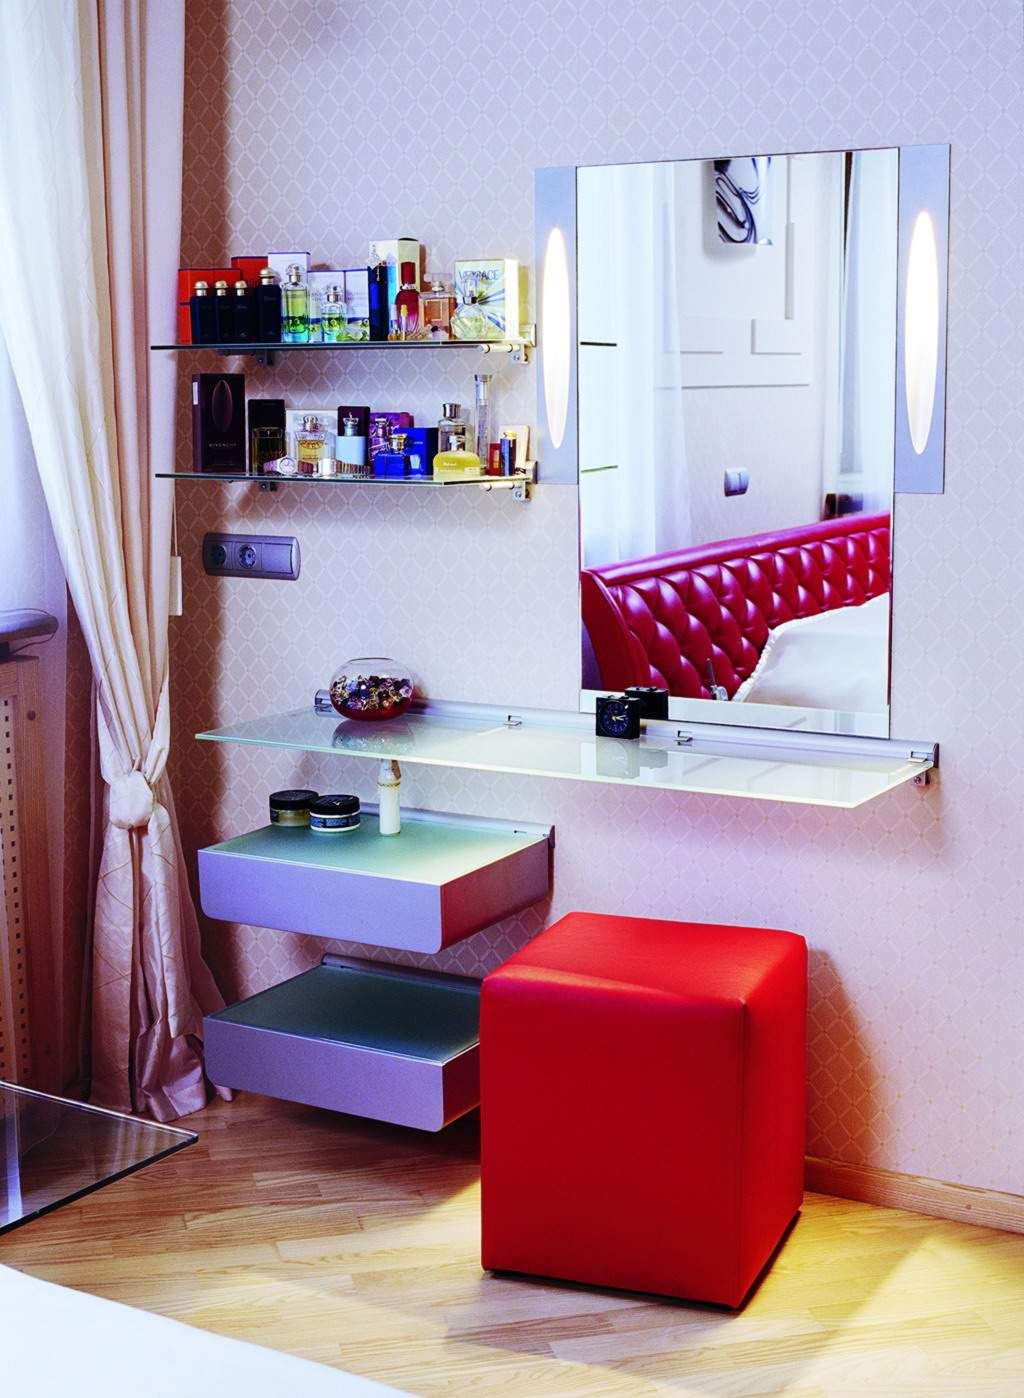 Best Interior Design Dressing Room High Quality Wallpapers Dressing Room Design Creative Home Decor Interior Room Decoration